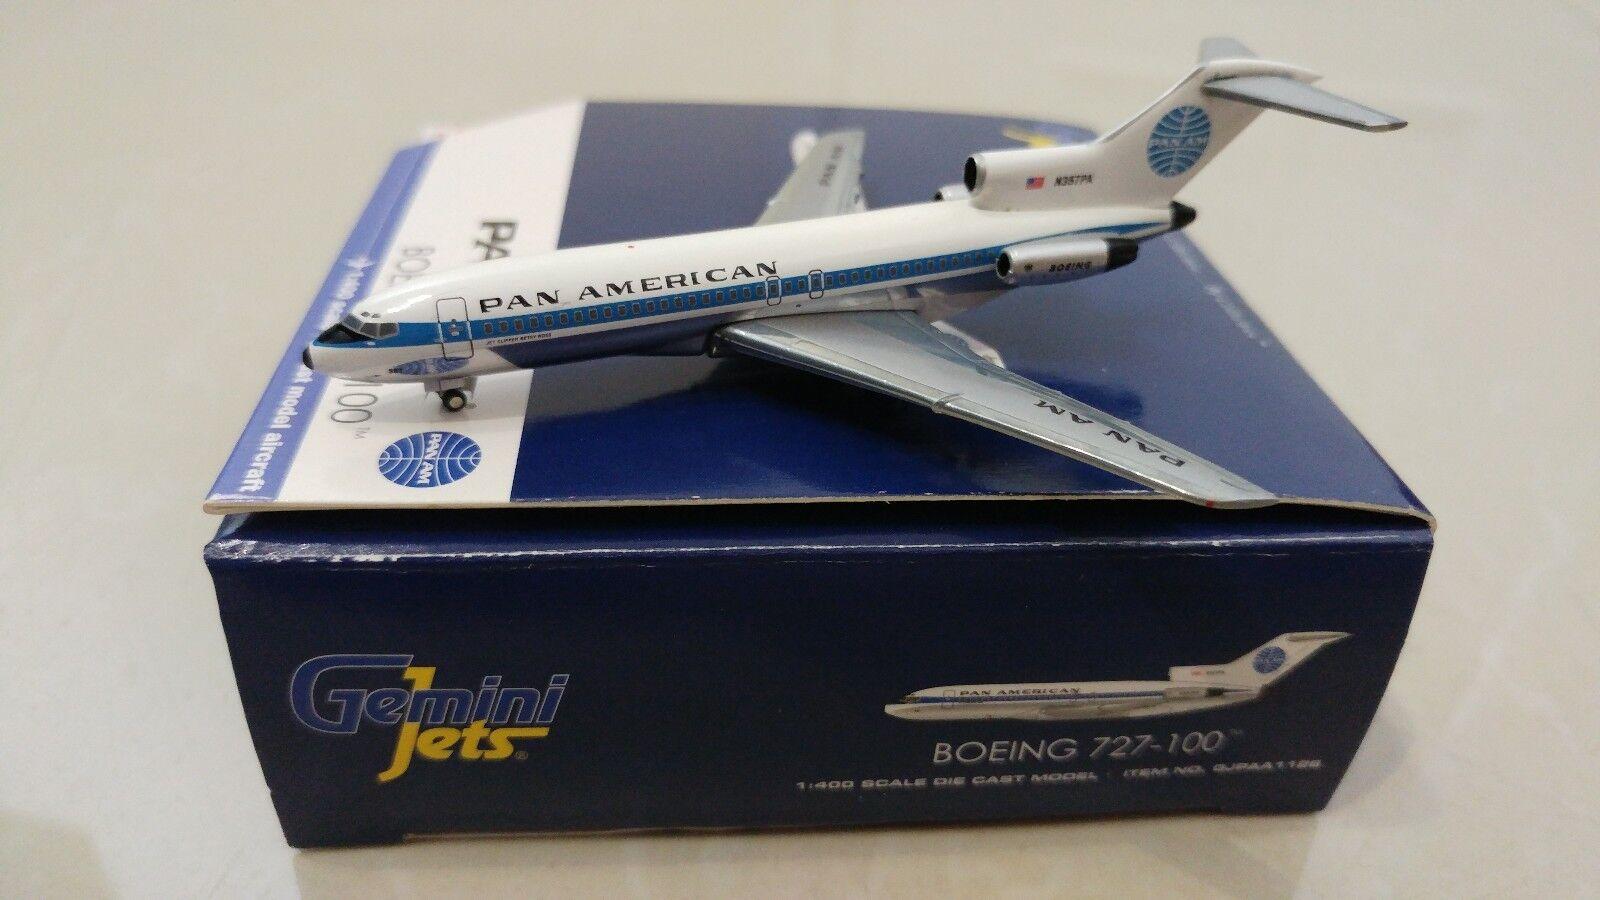 Gemini - jets 1 400 panam - boeing 727-100 n357pa gjpaa1126